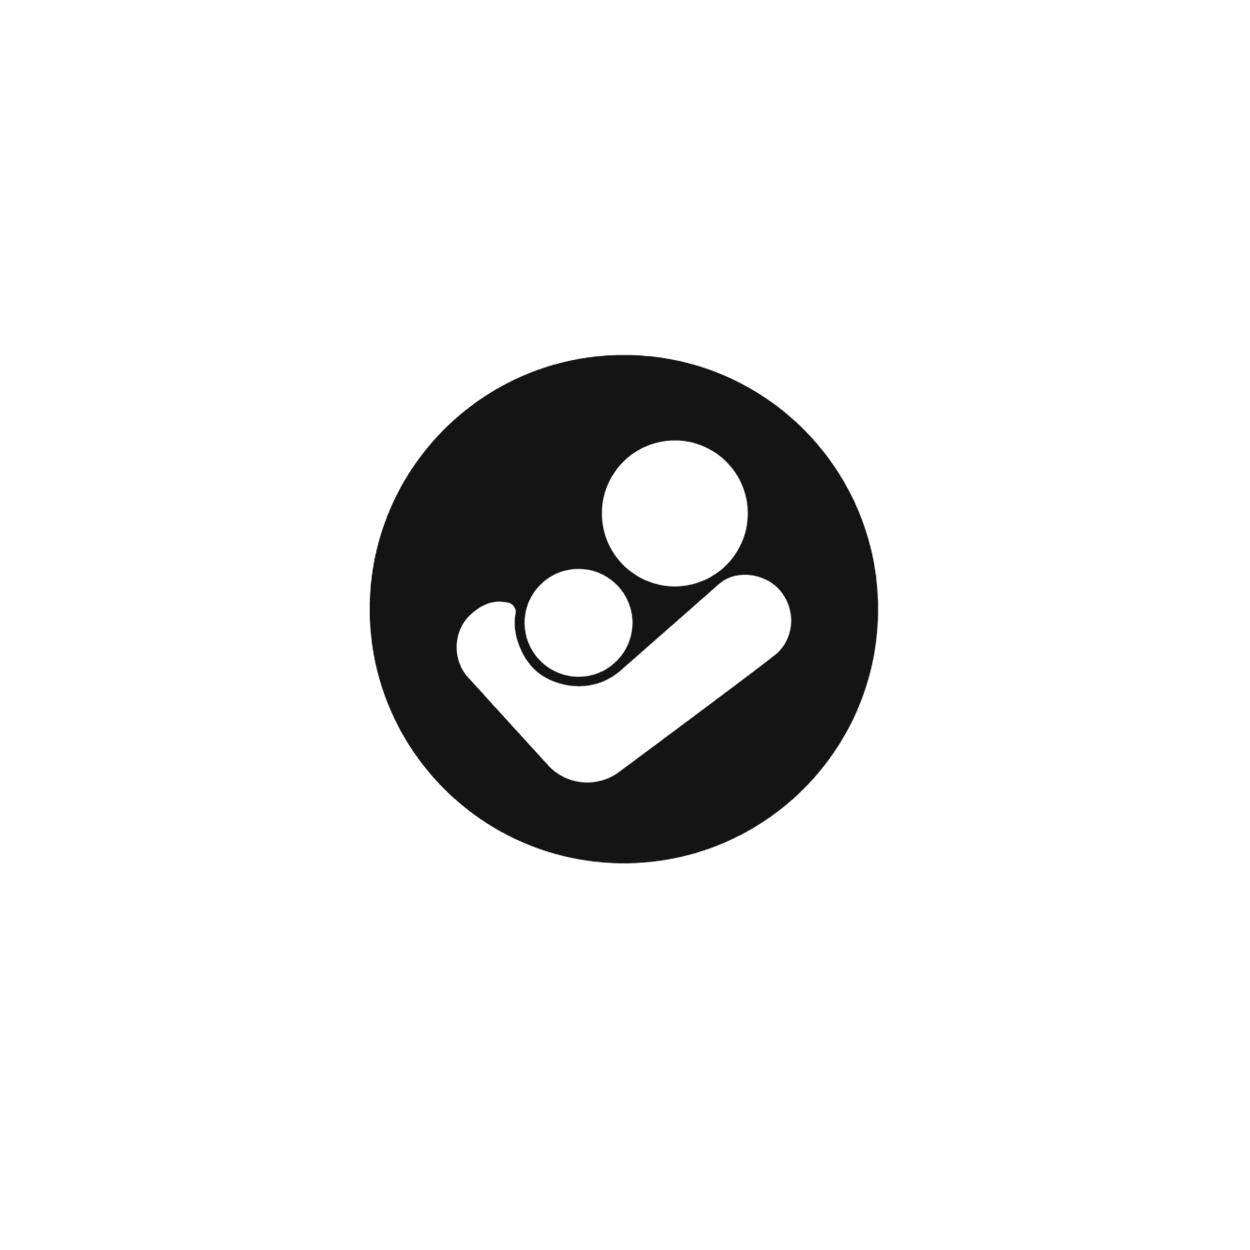 Francois Soulignac: Maxi-Cosi China, Dorel Juvenile - Campaign, Digital Guidelines, UI Prototyping - MADJOR Labbrand Shanghai, China